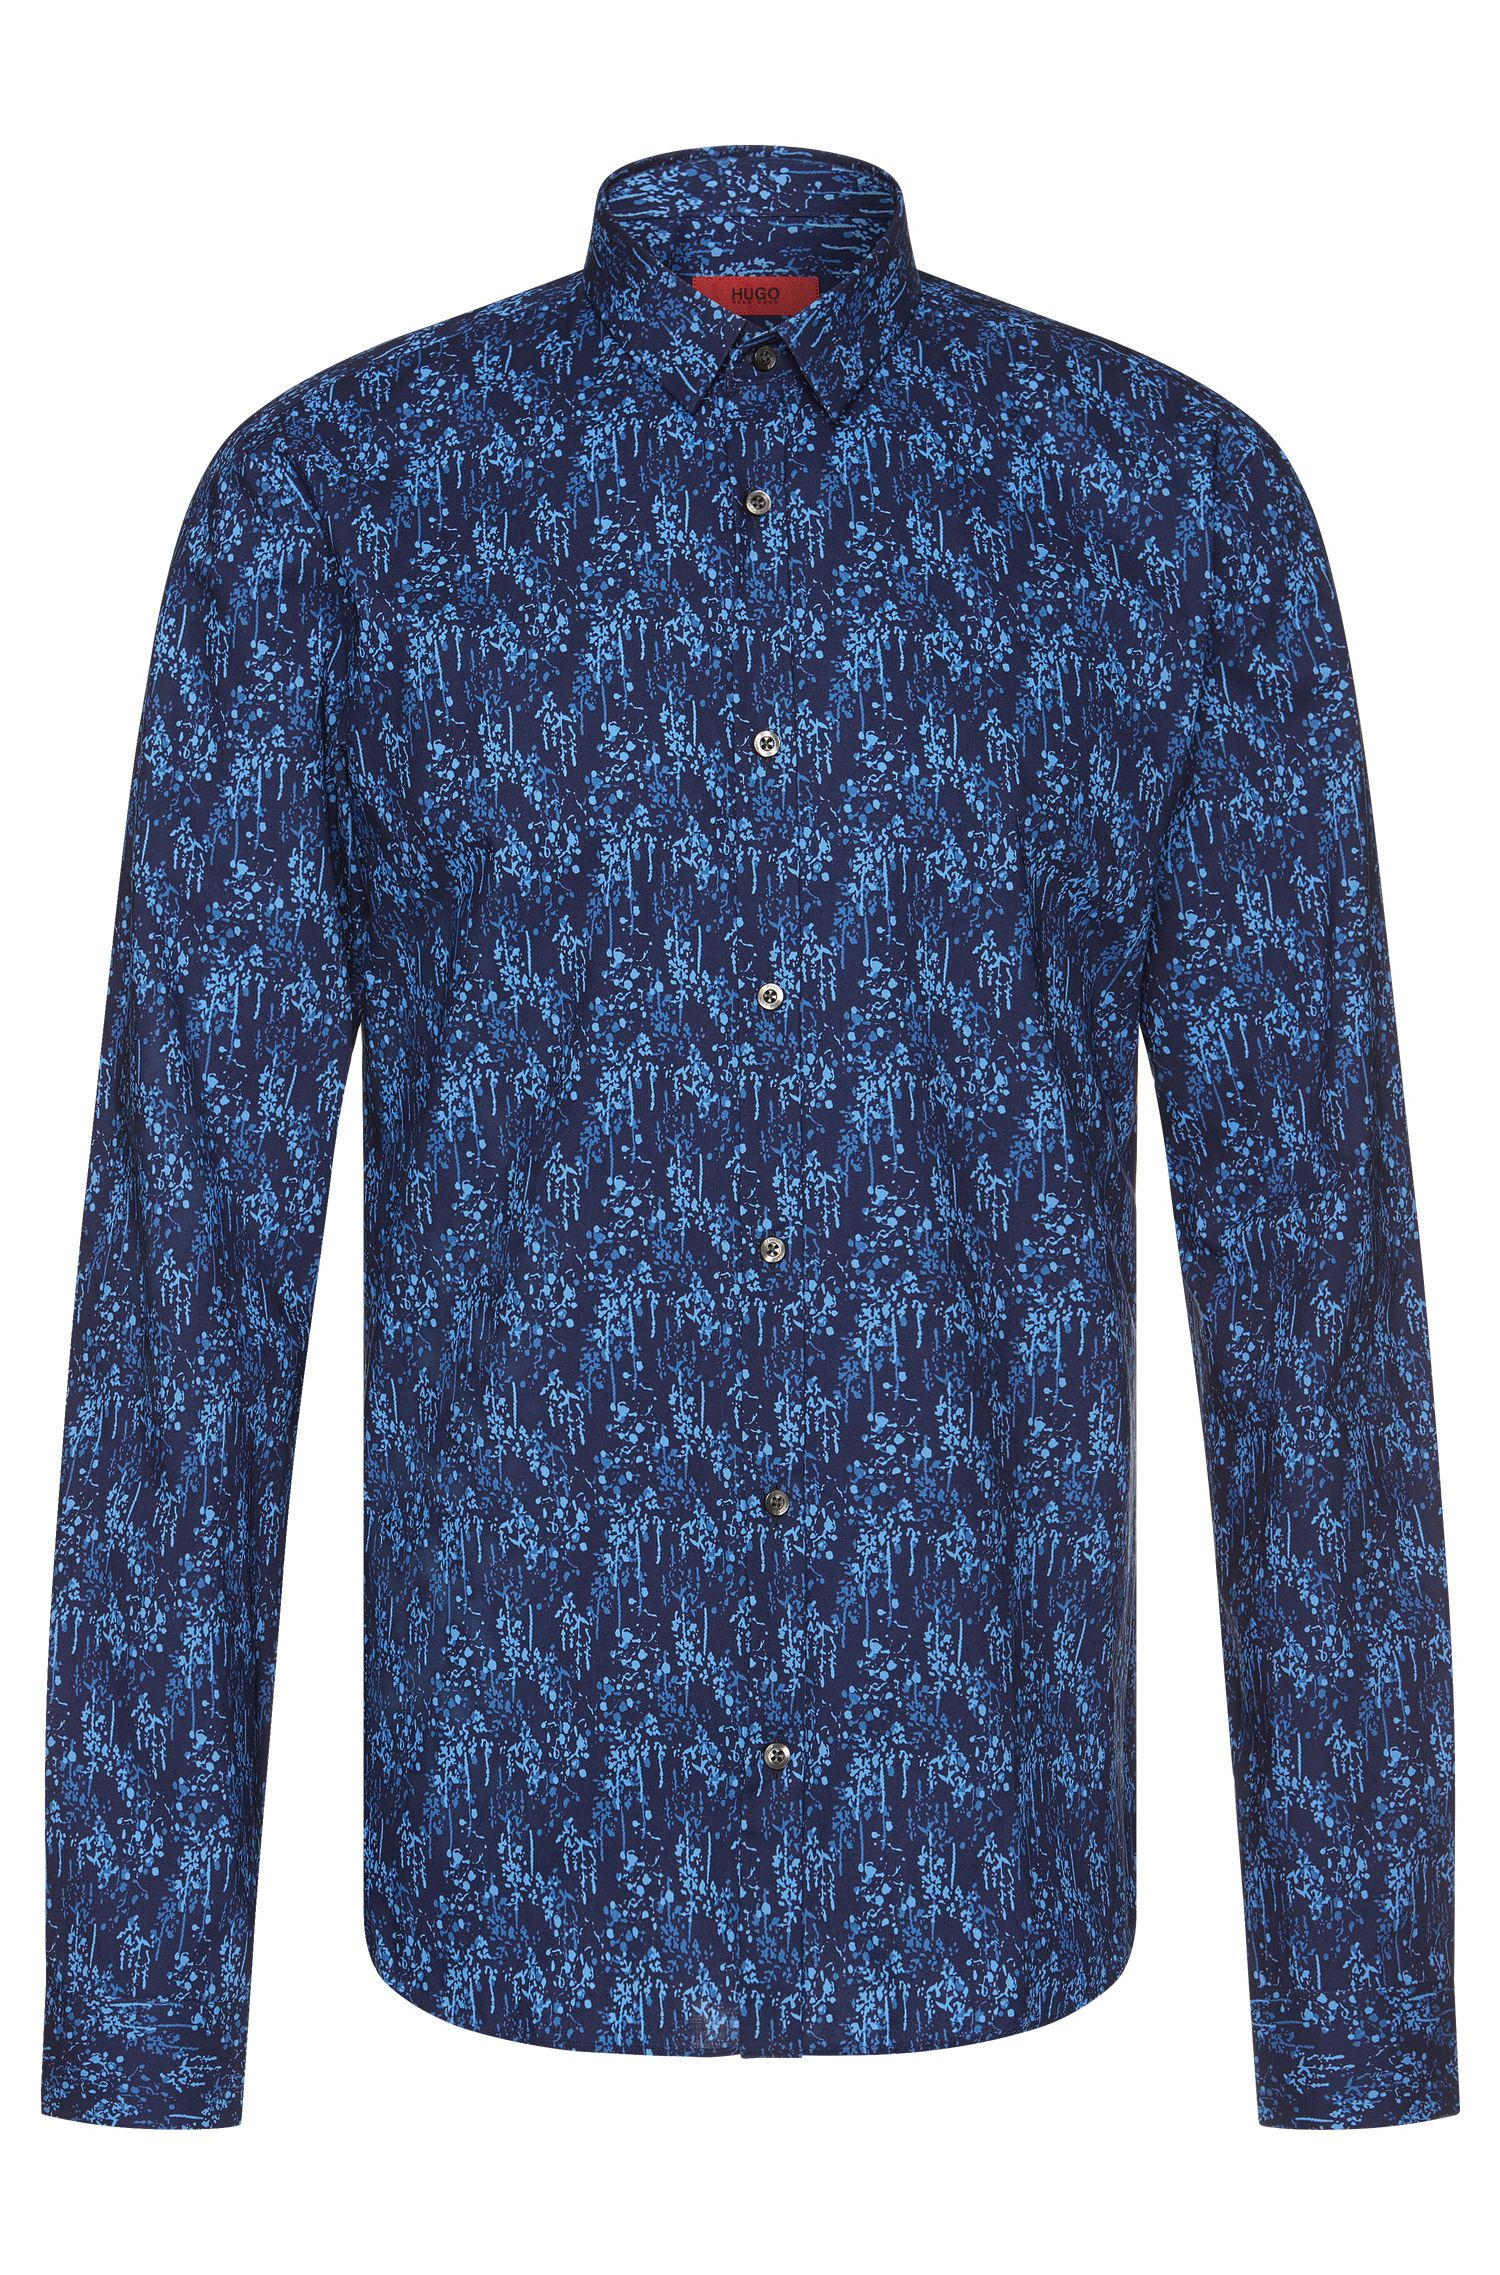 'Ero' | Slim Fit, Stretch Cotton Printed Button Down Shirt